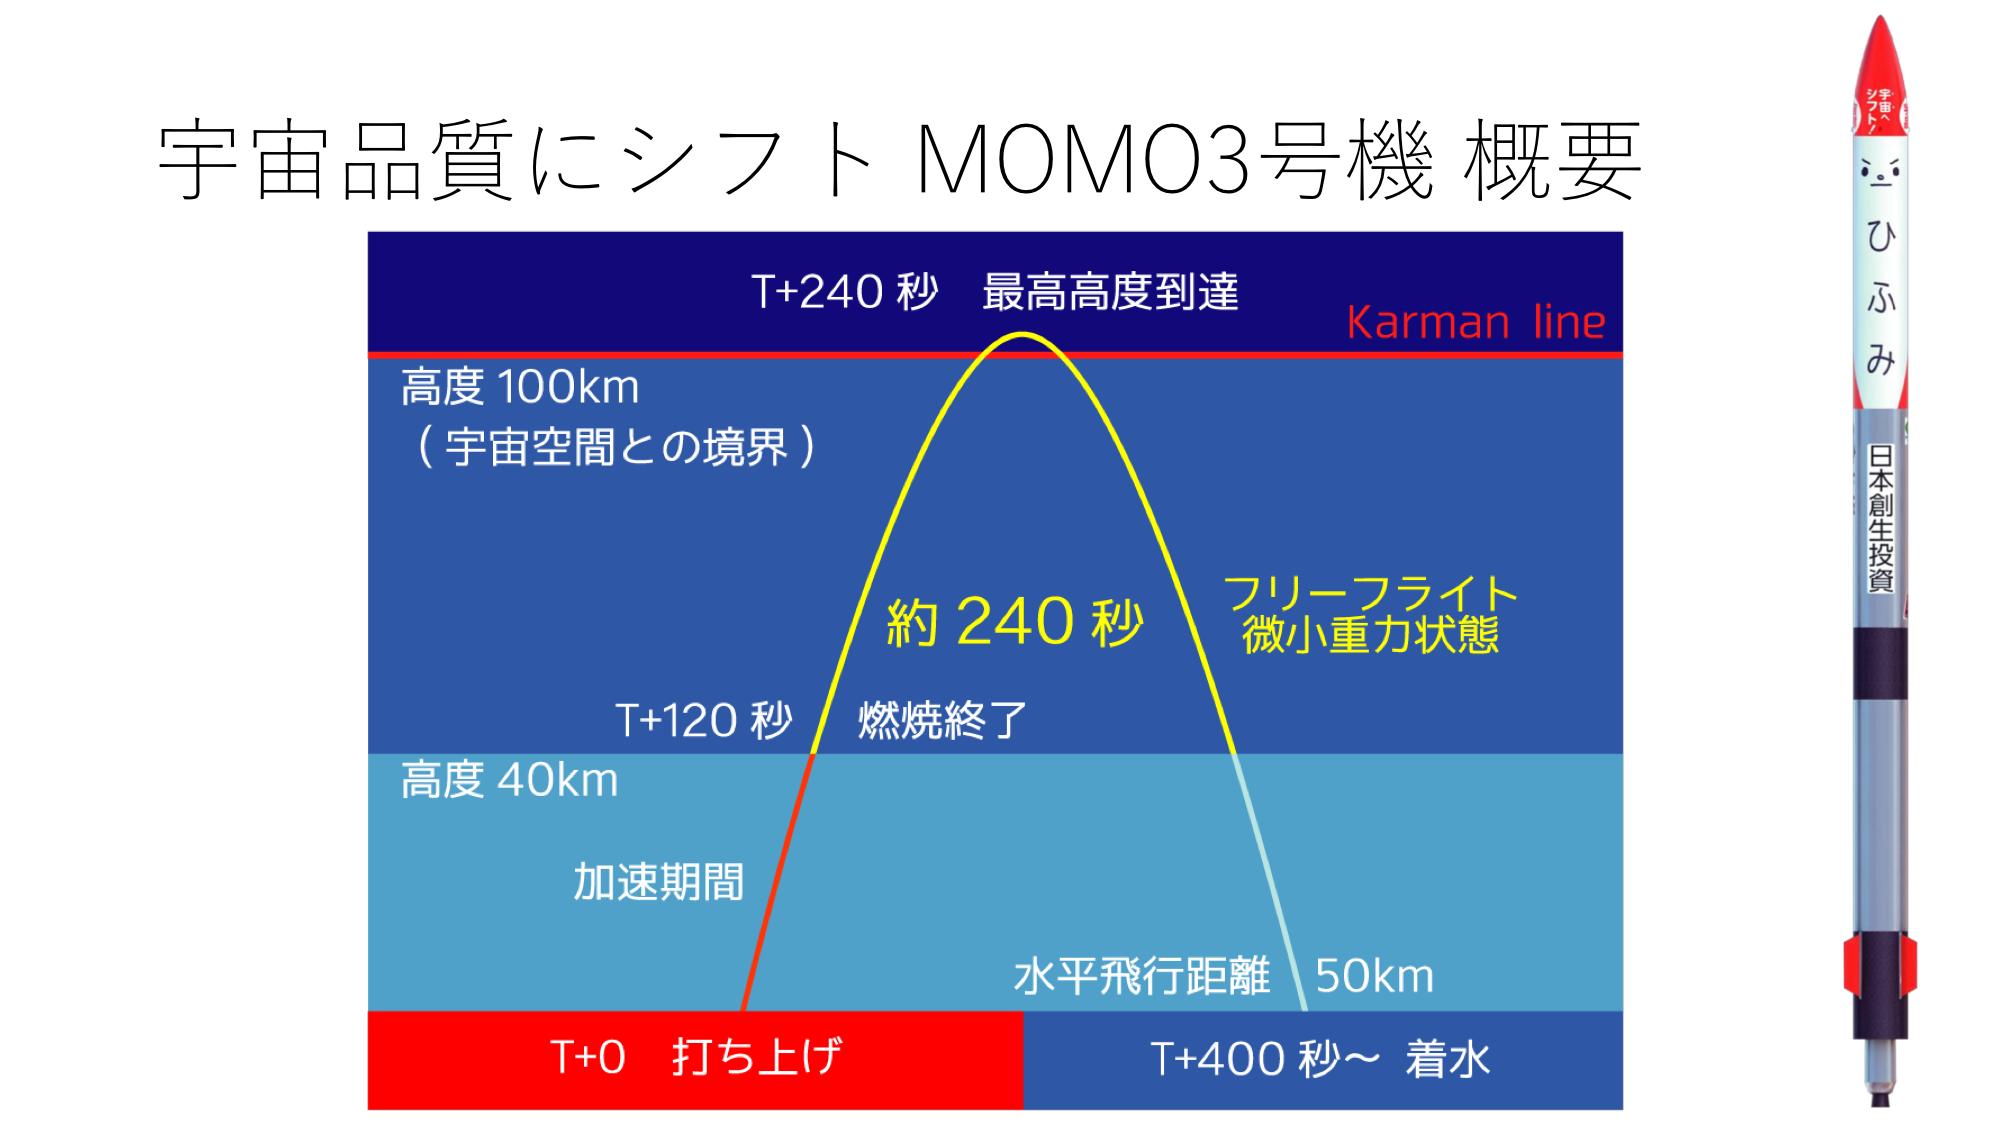 f:id:Imamura:20190414213957p:plain